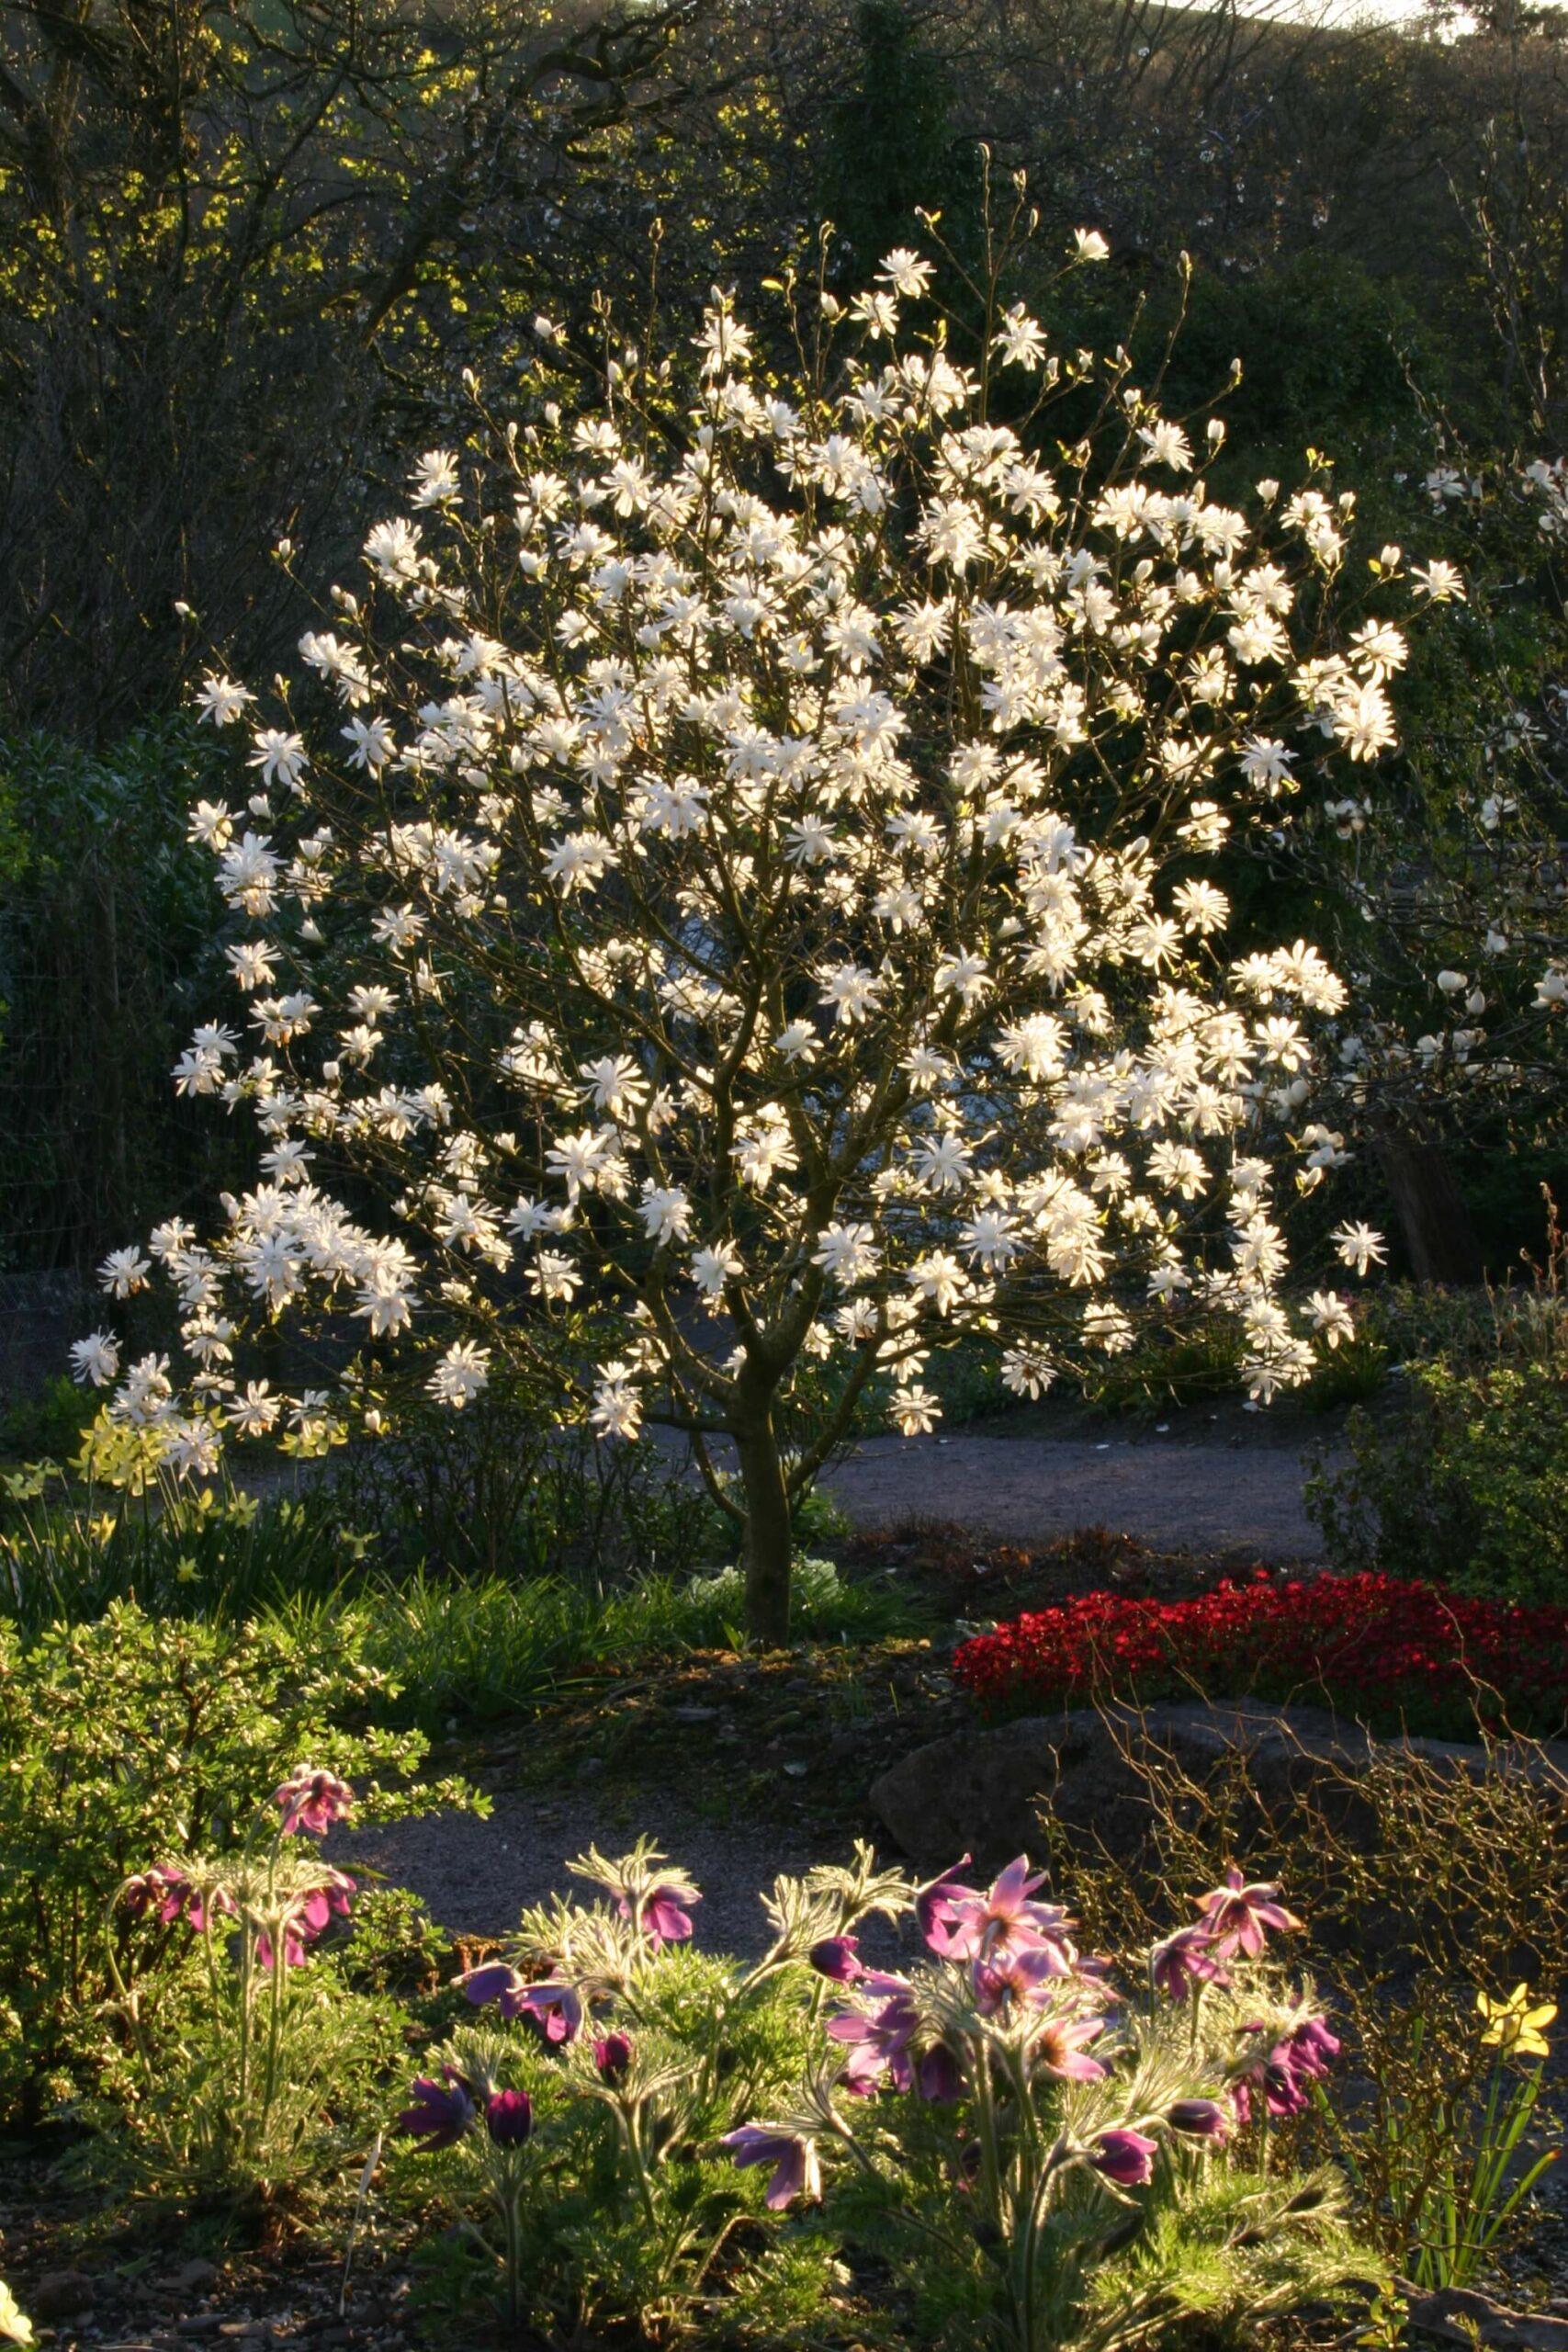 White Magnolia 'Ballerina' in flower at Aberglasney Gardens